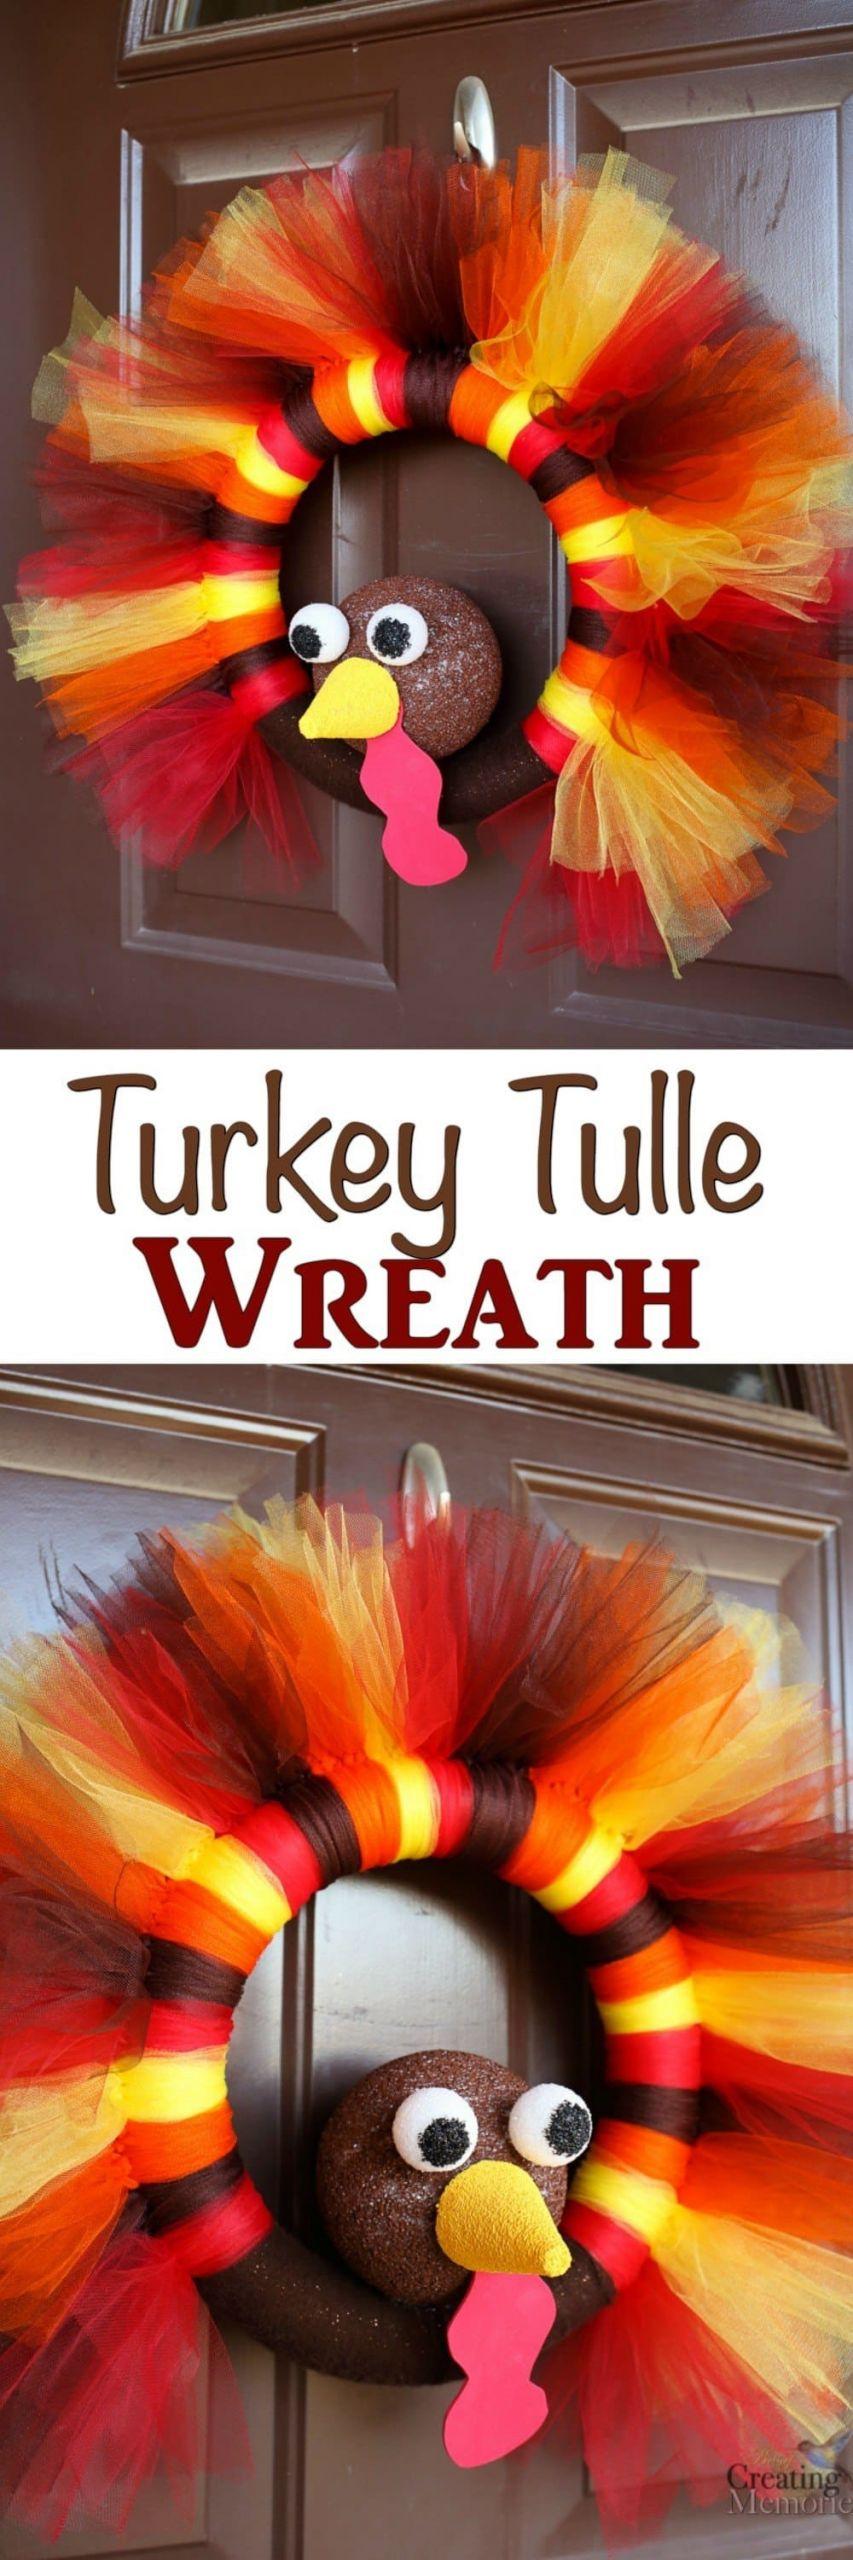 DIY Thanksgiving Decor Pinterest  DIY Turkey Tulle Wreath Best Thanksgiving Wreath for your door